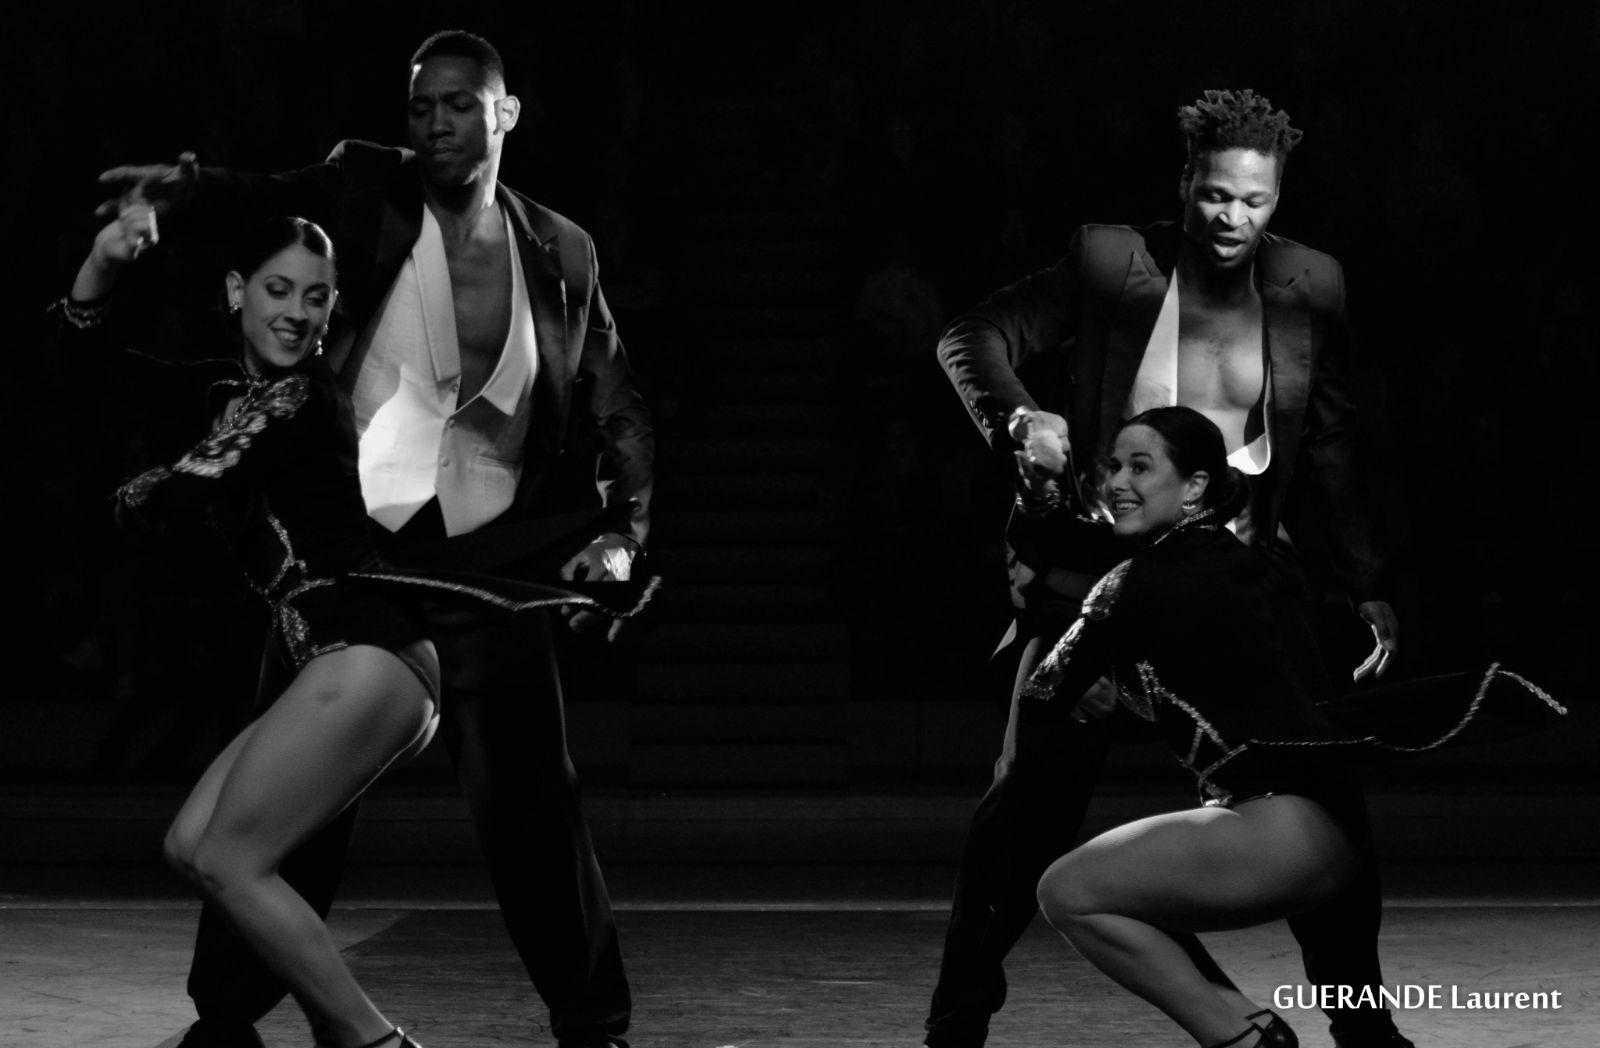 Guerande Laurent, salsa, xtremambo, salsa hip hop, salsa hip hop paris, paris salsa hip hop battle, compagnie salsa hip hop, show salsa hip hop, show neosalsa, rodrigue lino, chorégraphe, danseurs, beauté, danse en talon, spectacle salsa hip hop, vernon, breakdance,